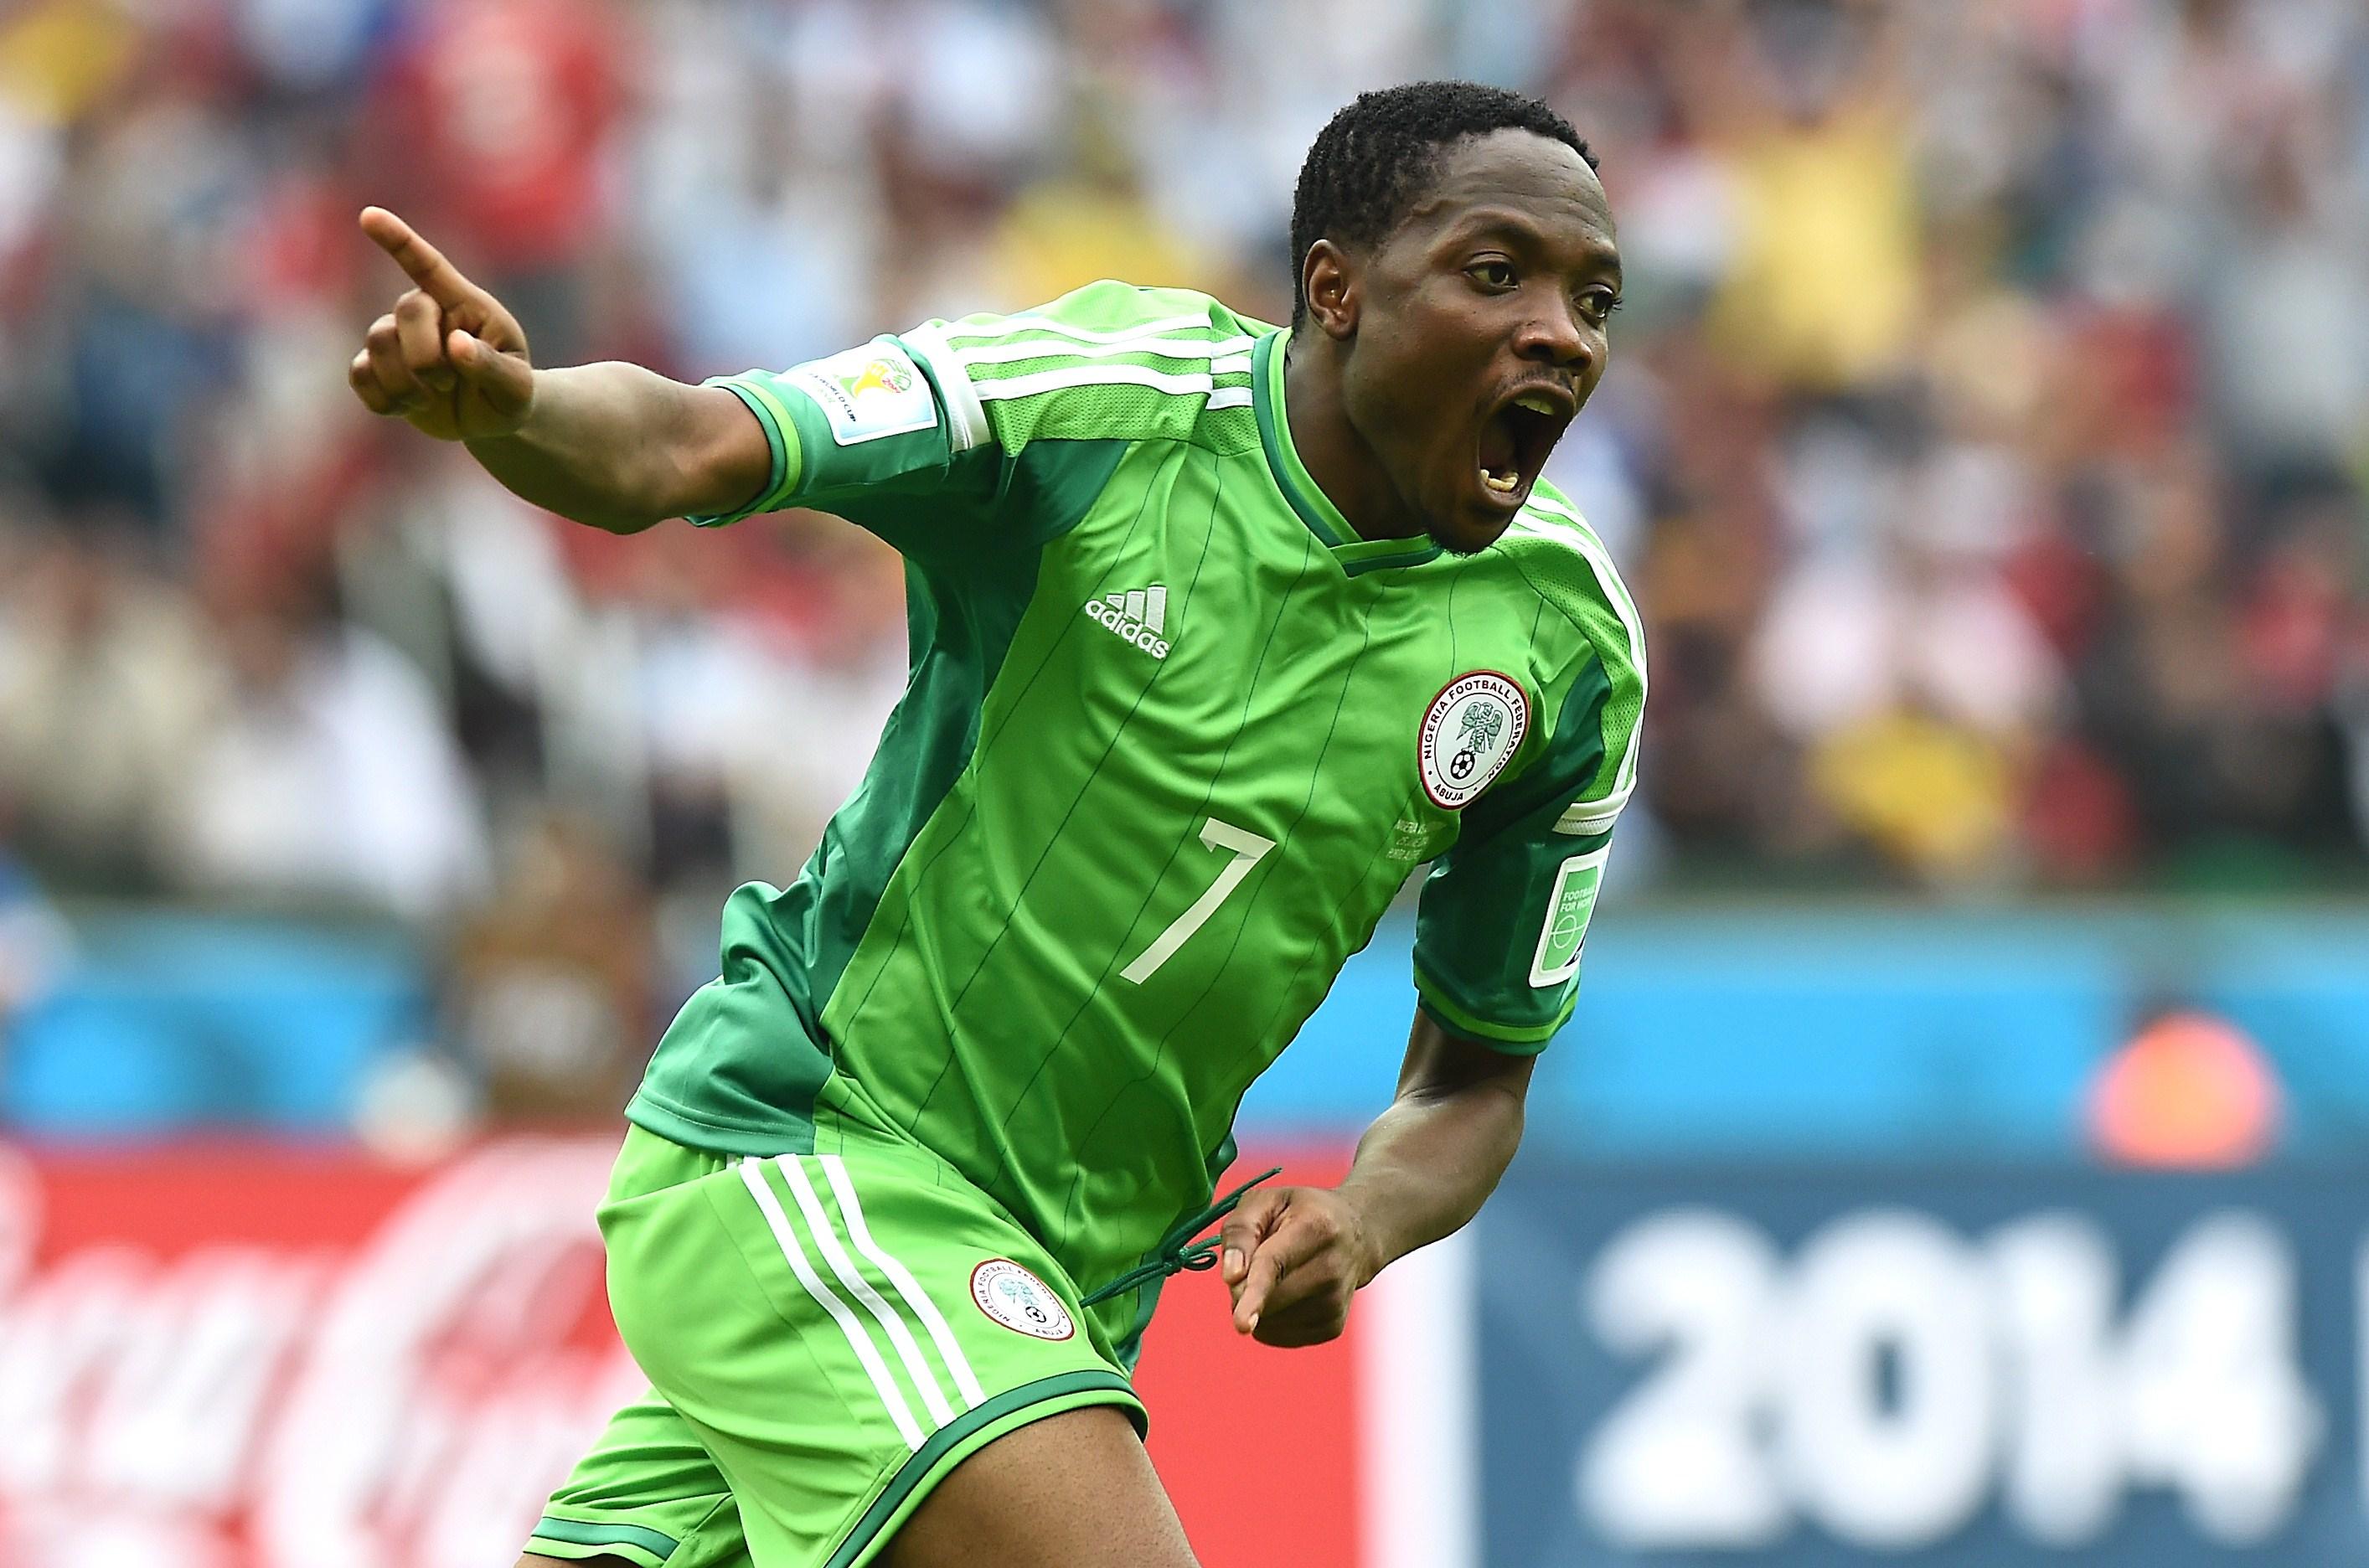 Nigeria's forward Ahmed Musa celebrates